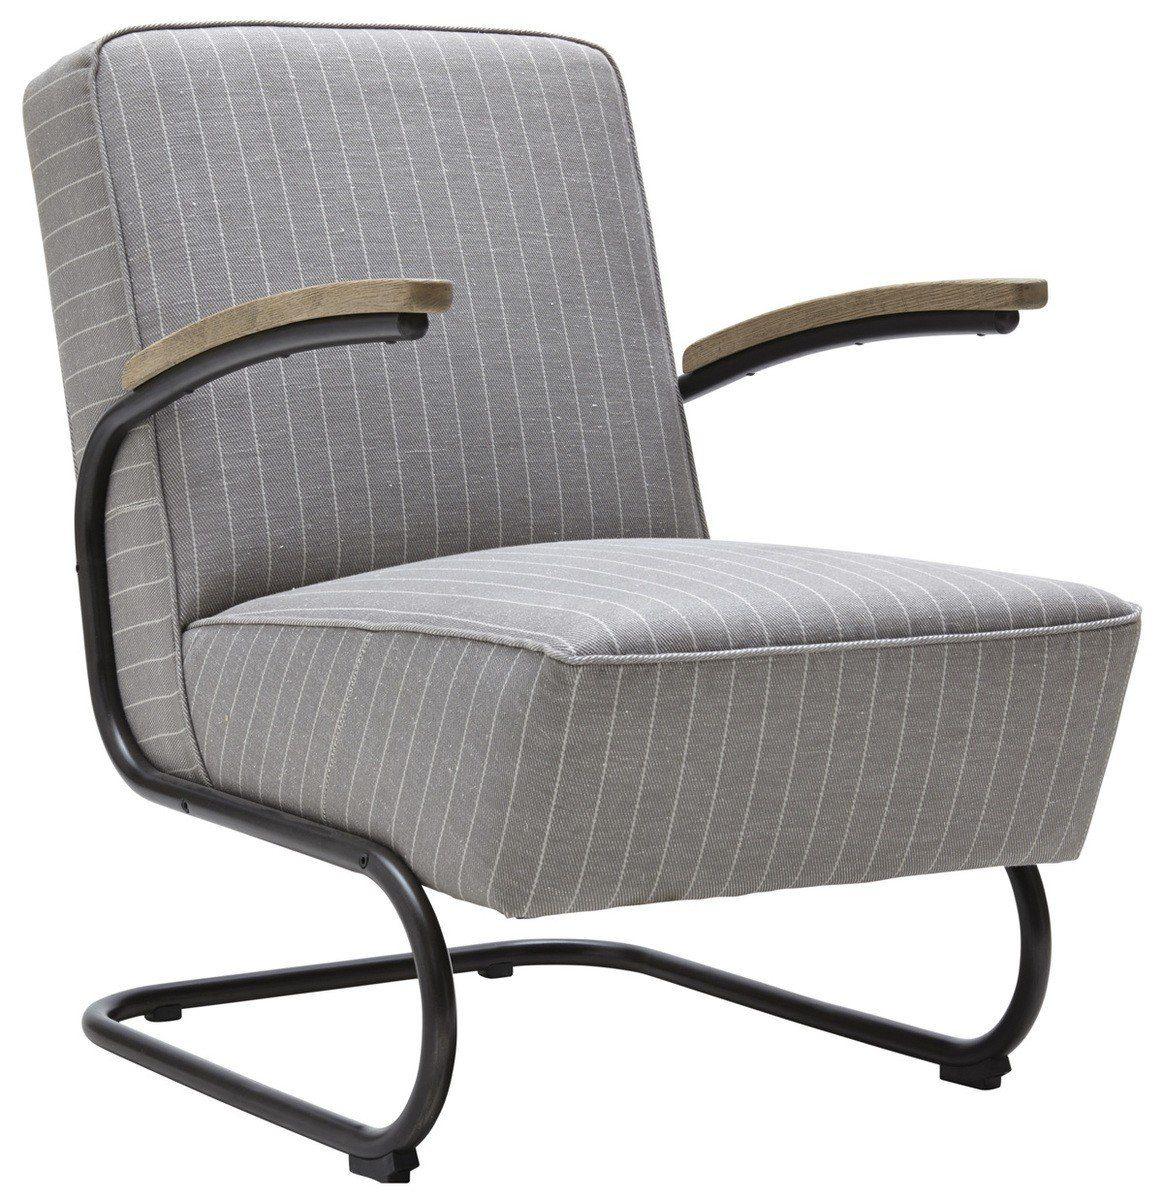 Kasper-Wohndesign Sessel Stoff grau Freischwinger »Joe«